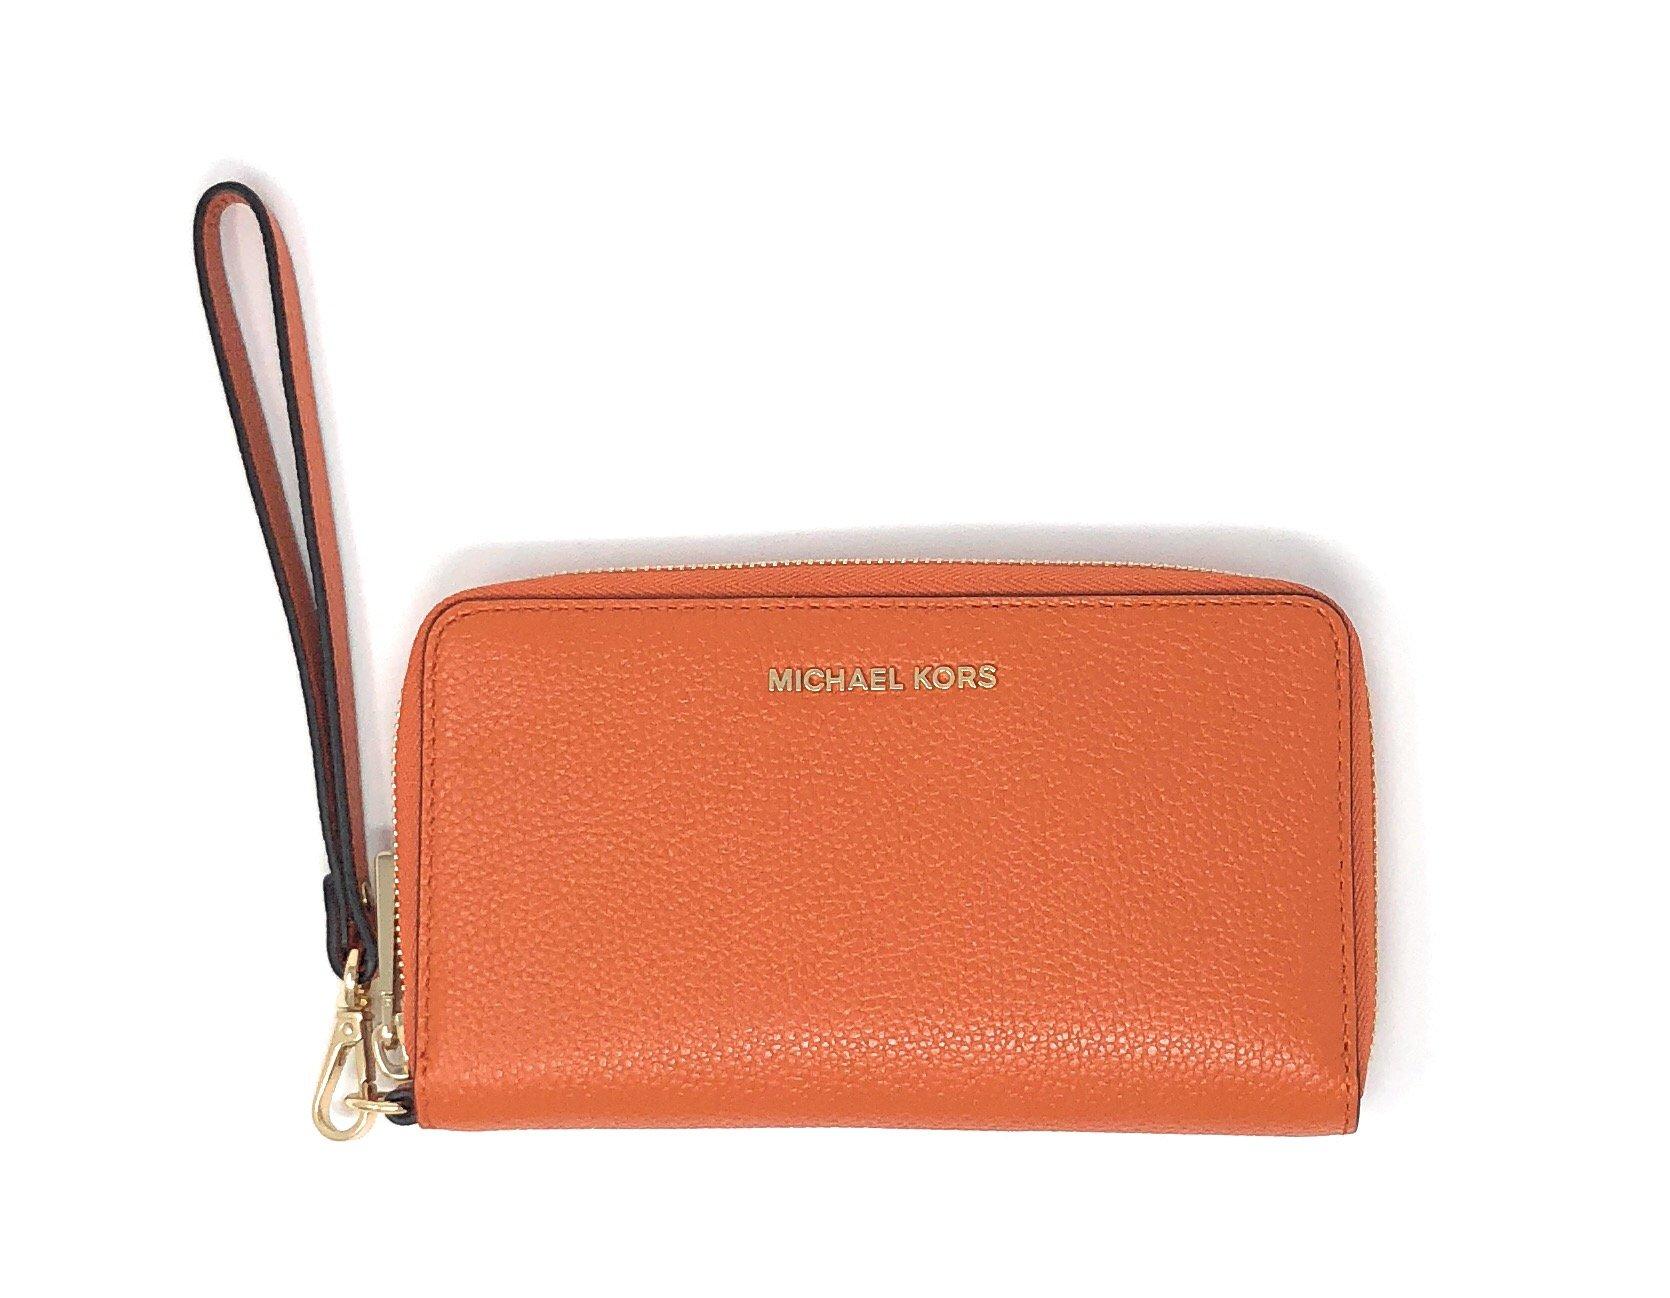 Michael Kors Women's Jet Set Travel Large Smartphone Wristlet (Tangerine Leather)